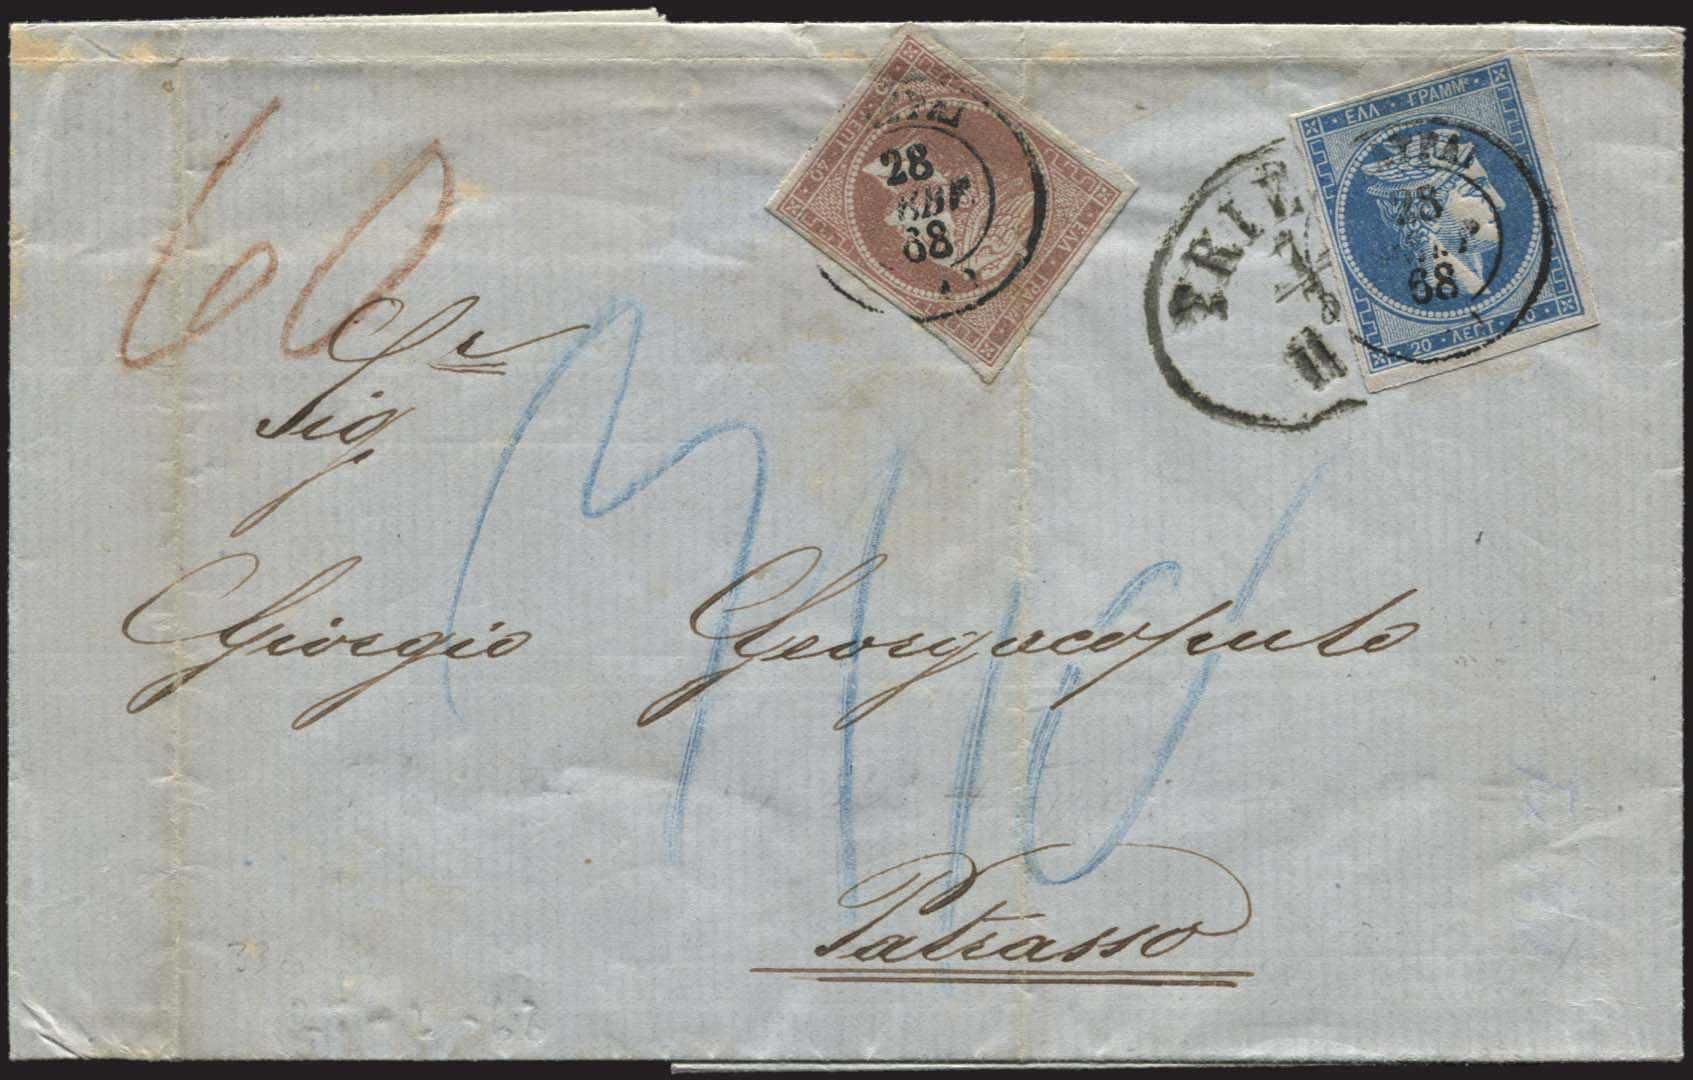 Lot 114 - -  LARGE HERMES HEAD 1862/67 consecutive athens printings -  A. Karamitsos Postal & Live Internet Auction 678 General Philatelic Auction